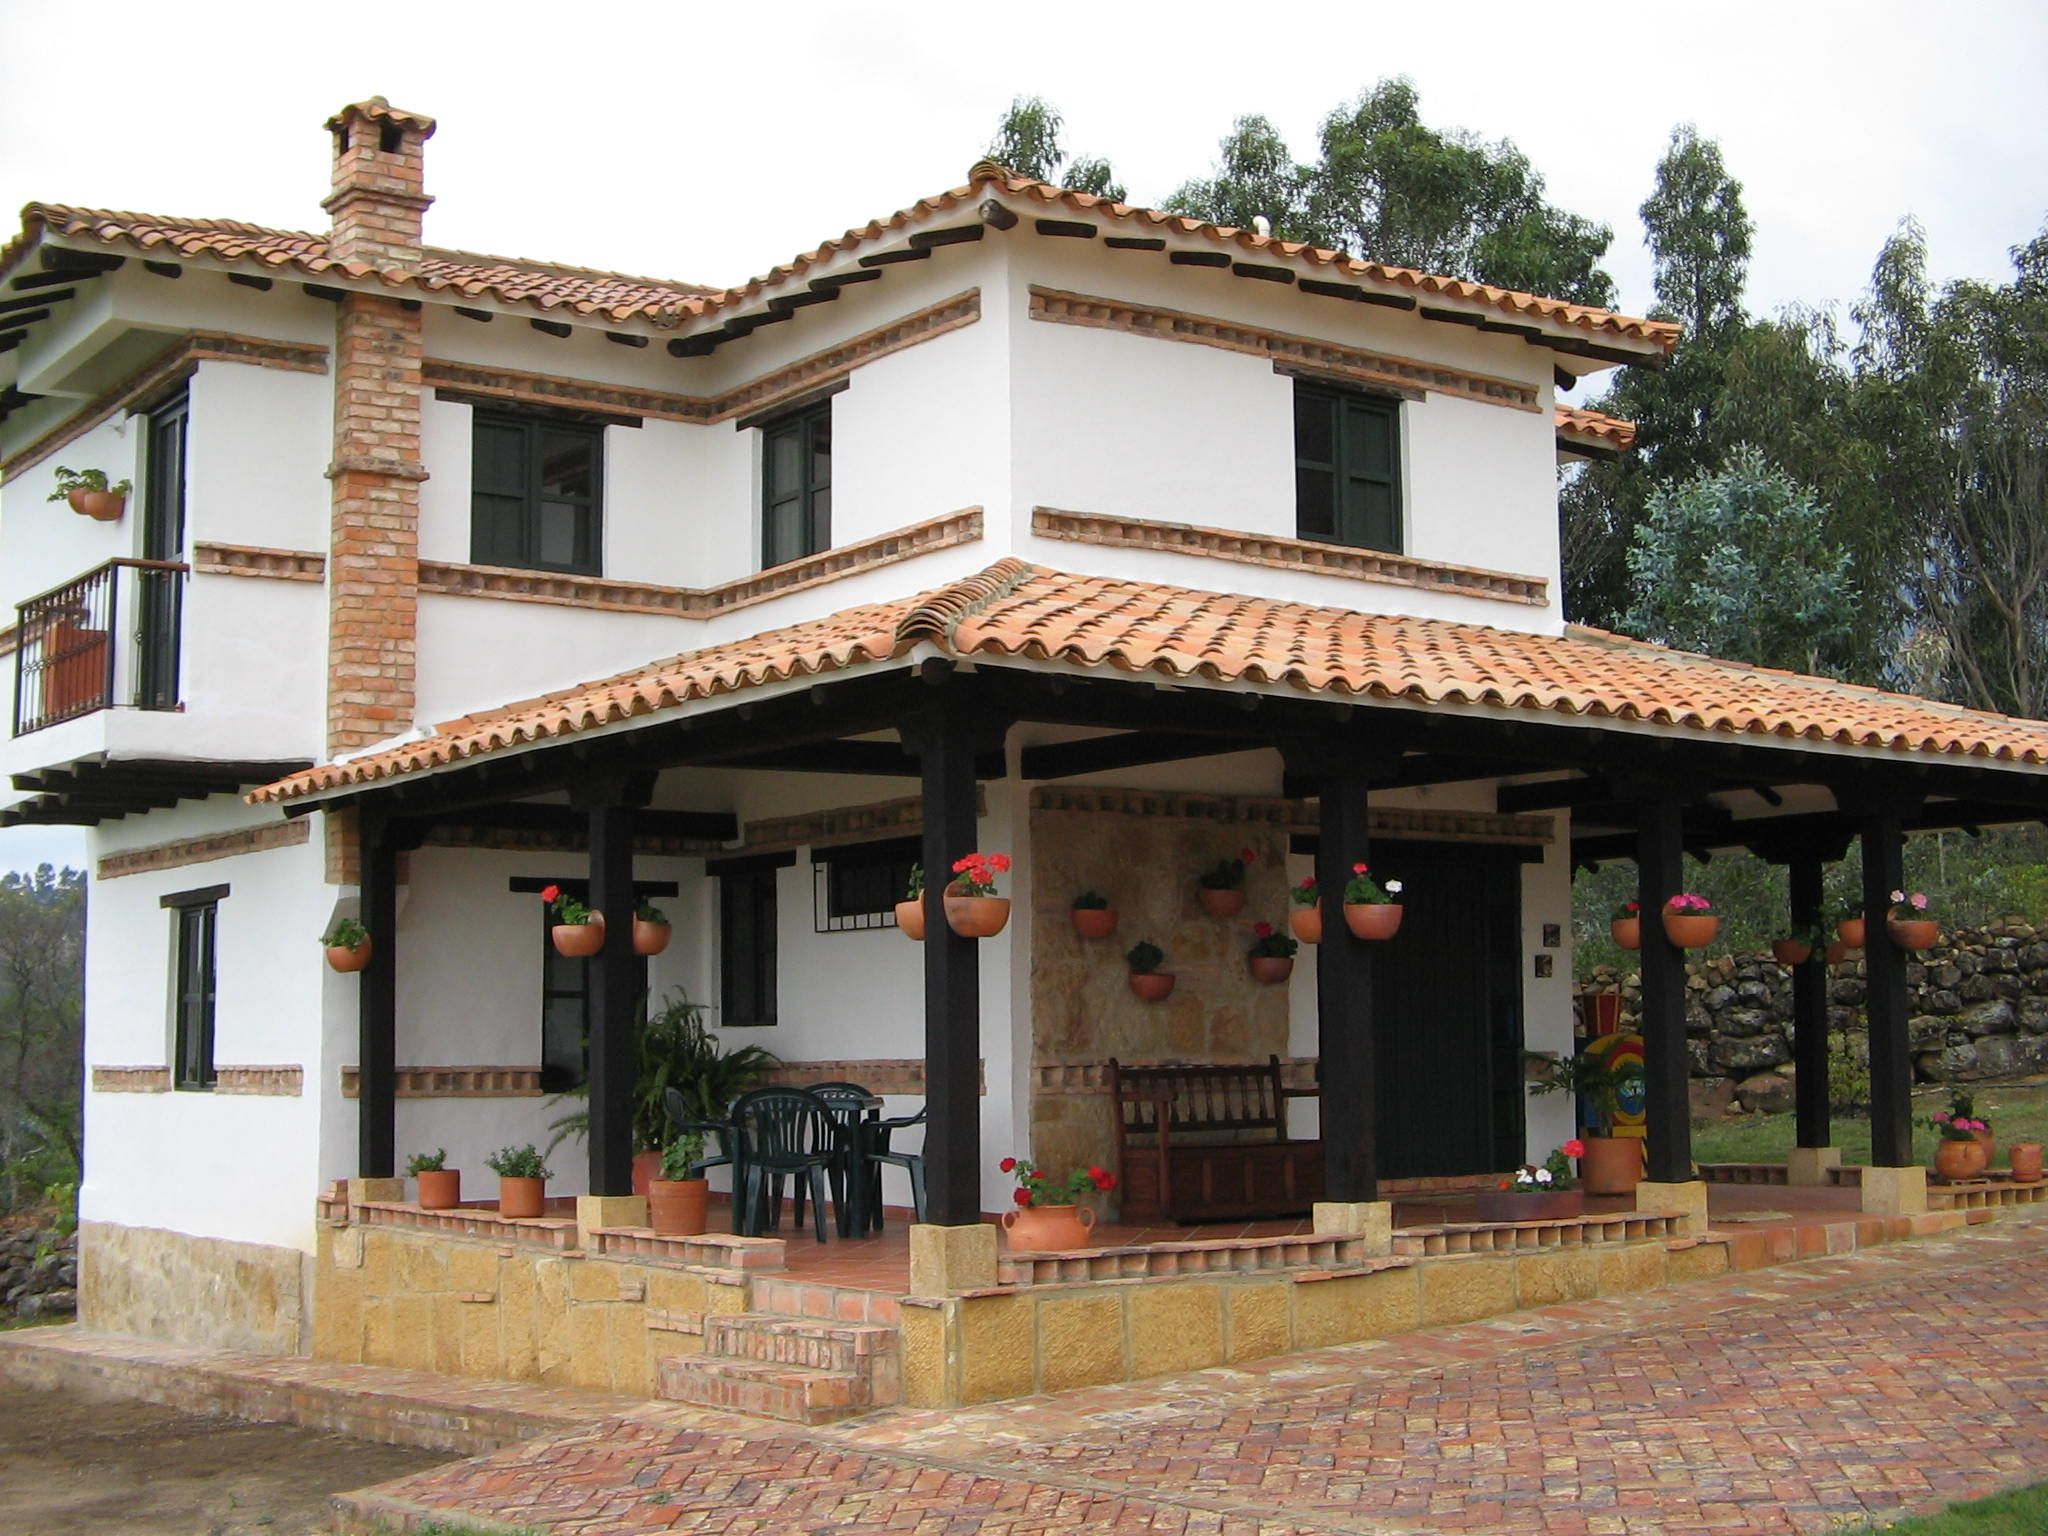 Modelos de casas llaneras buscar con google agro 2015 - Casas rurales prefabricadas ...